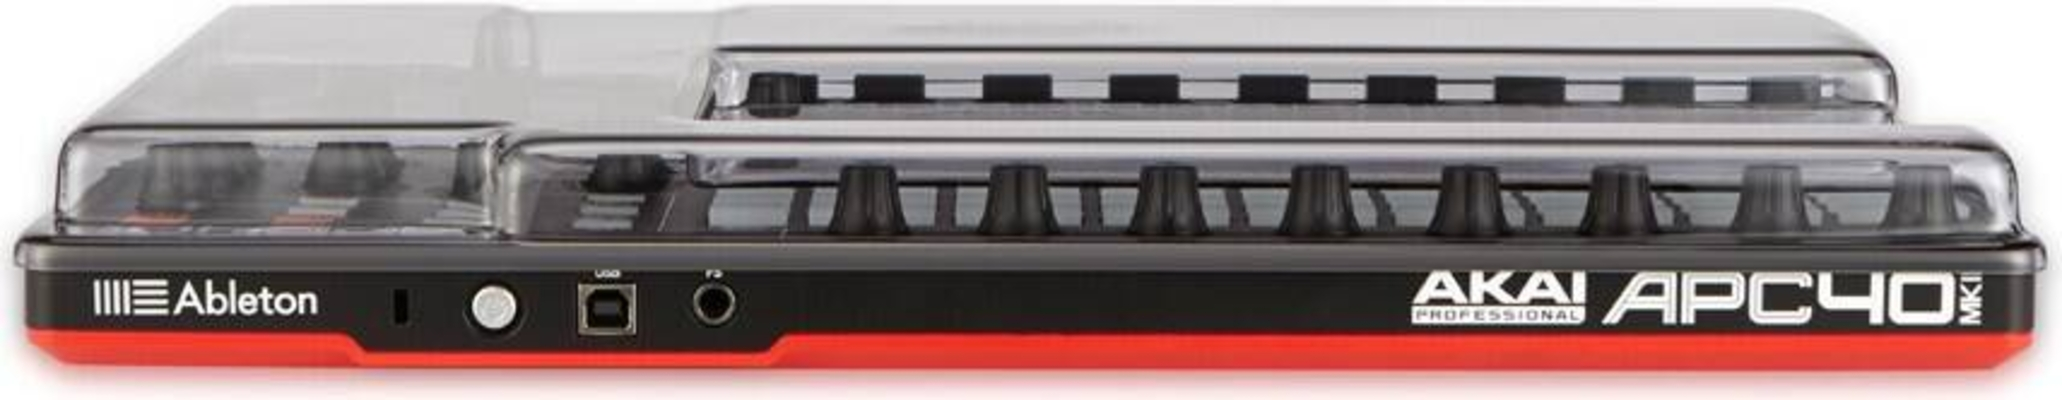 Decksaver DS-PC-APC40MK2